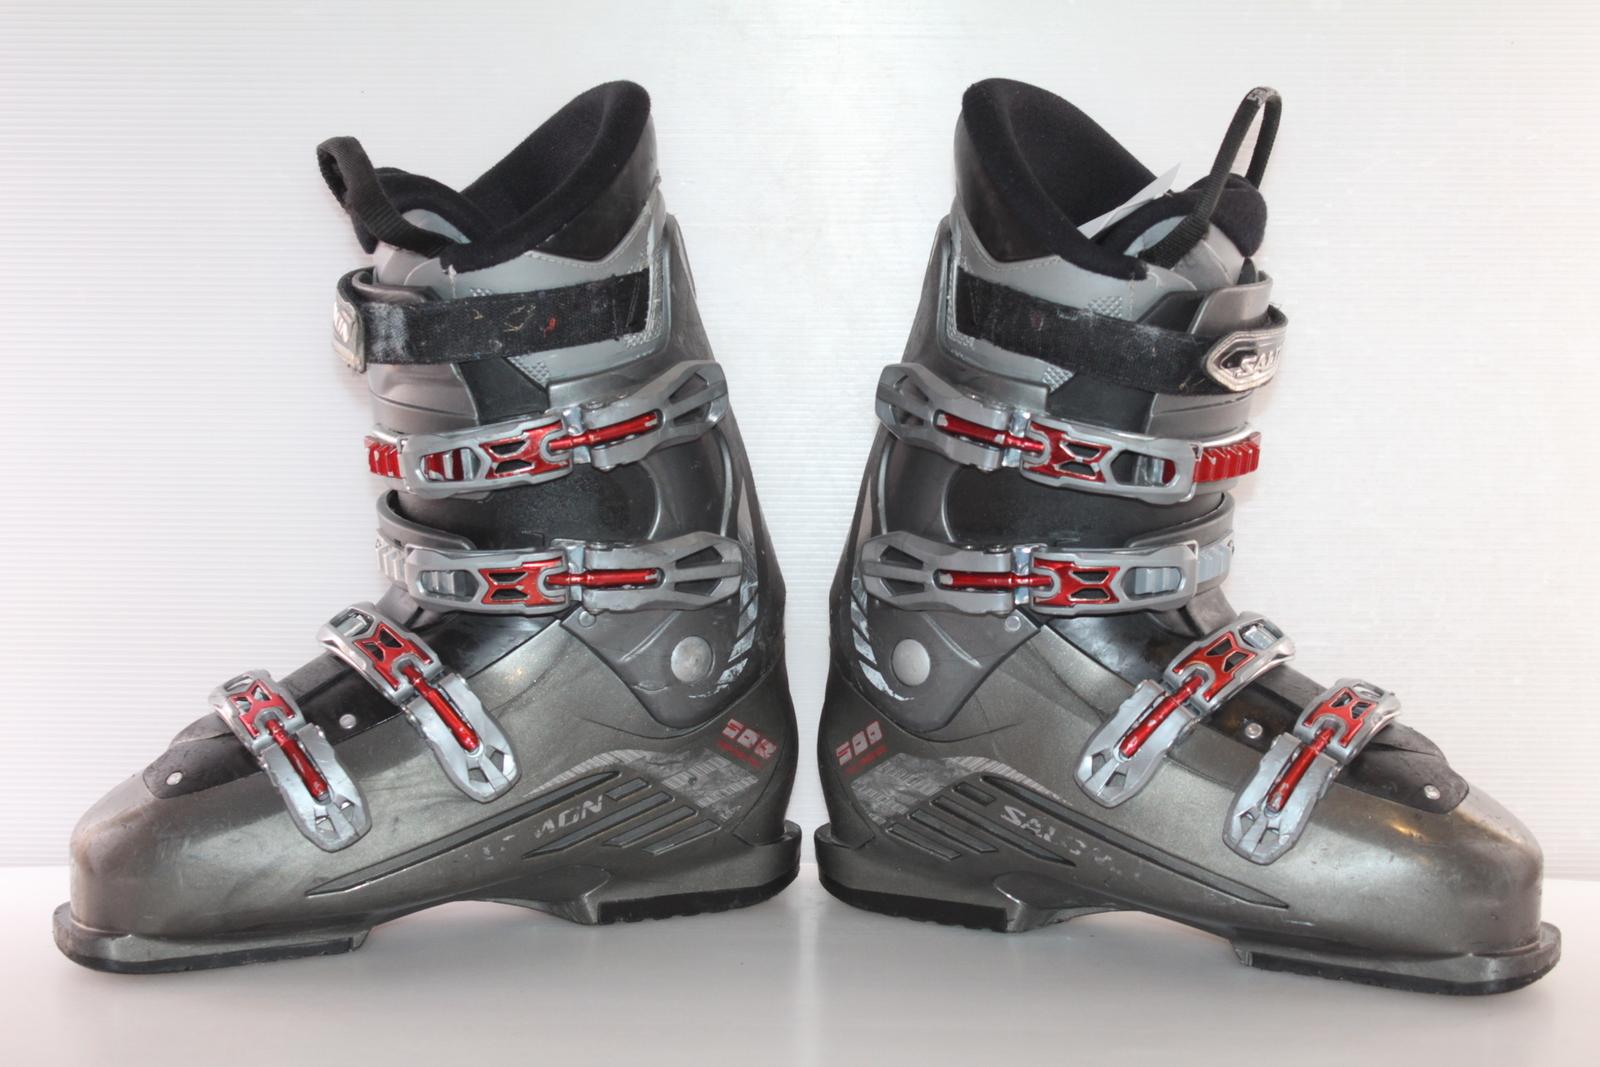 Lyžařské boty Salomon Performa 500 vel. EU43.5 flexe 80